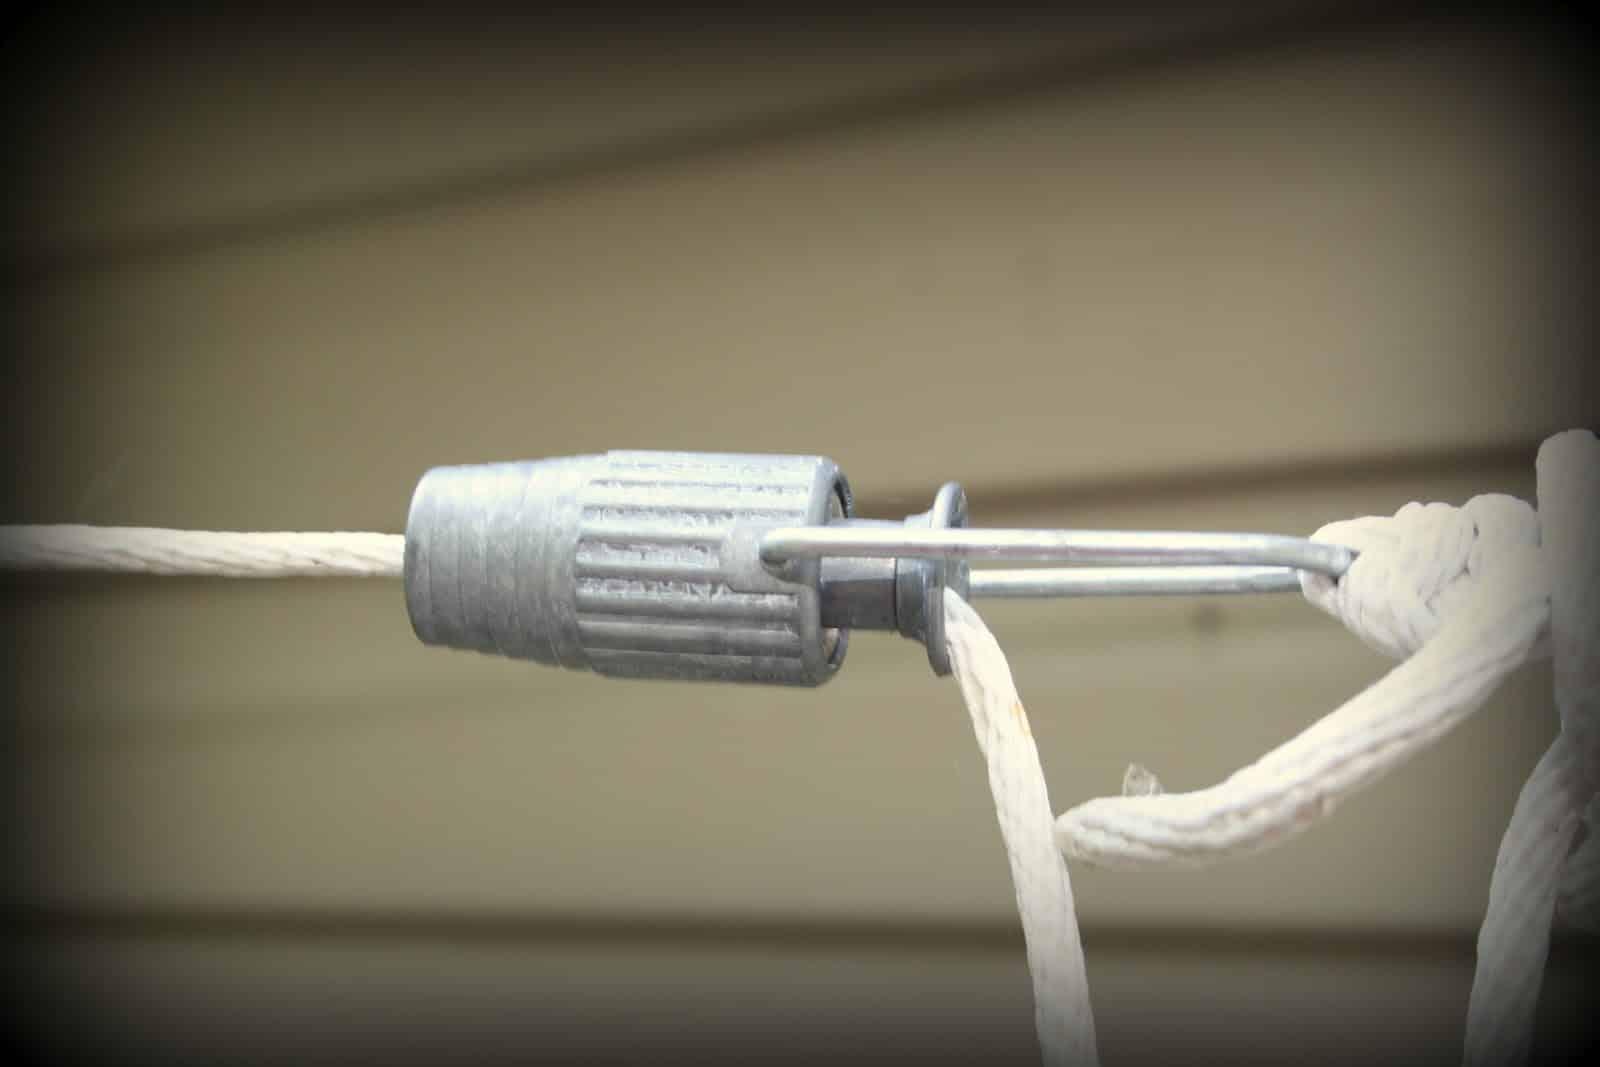 Clothesline tightener